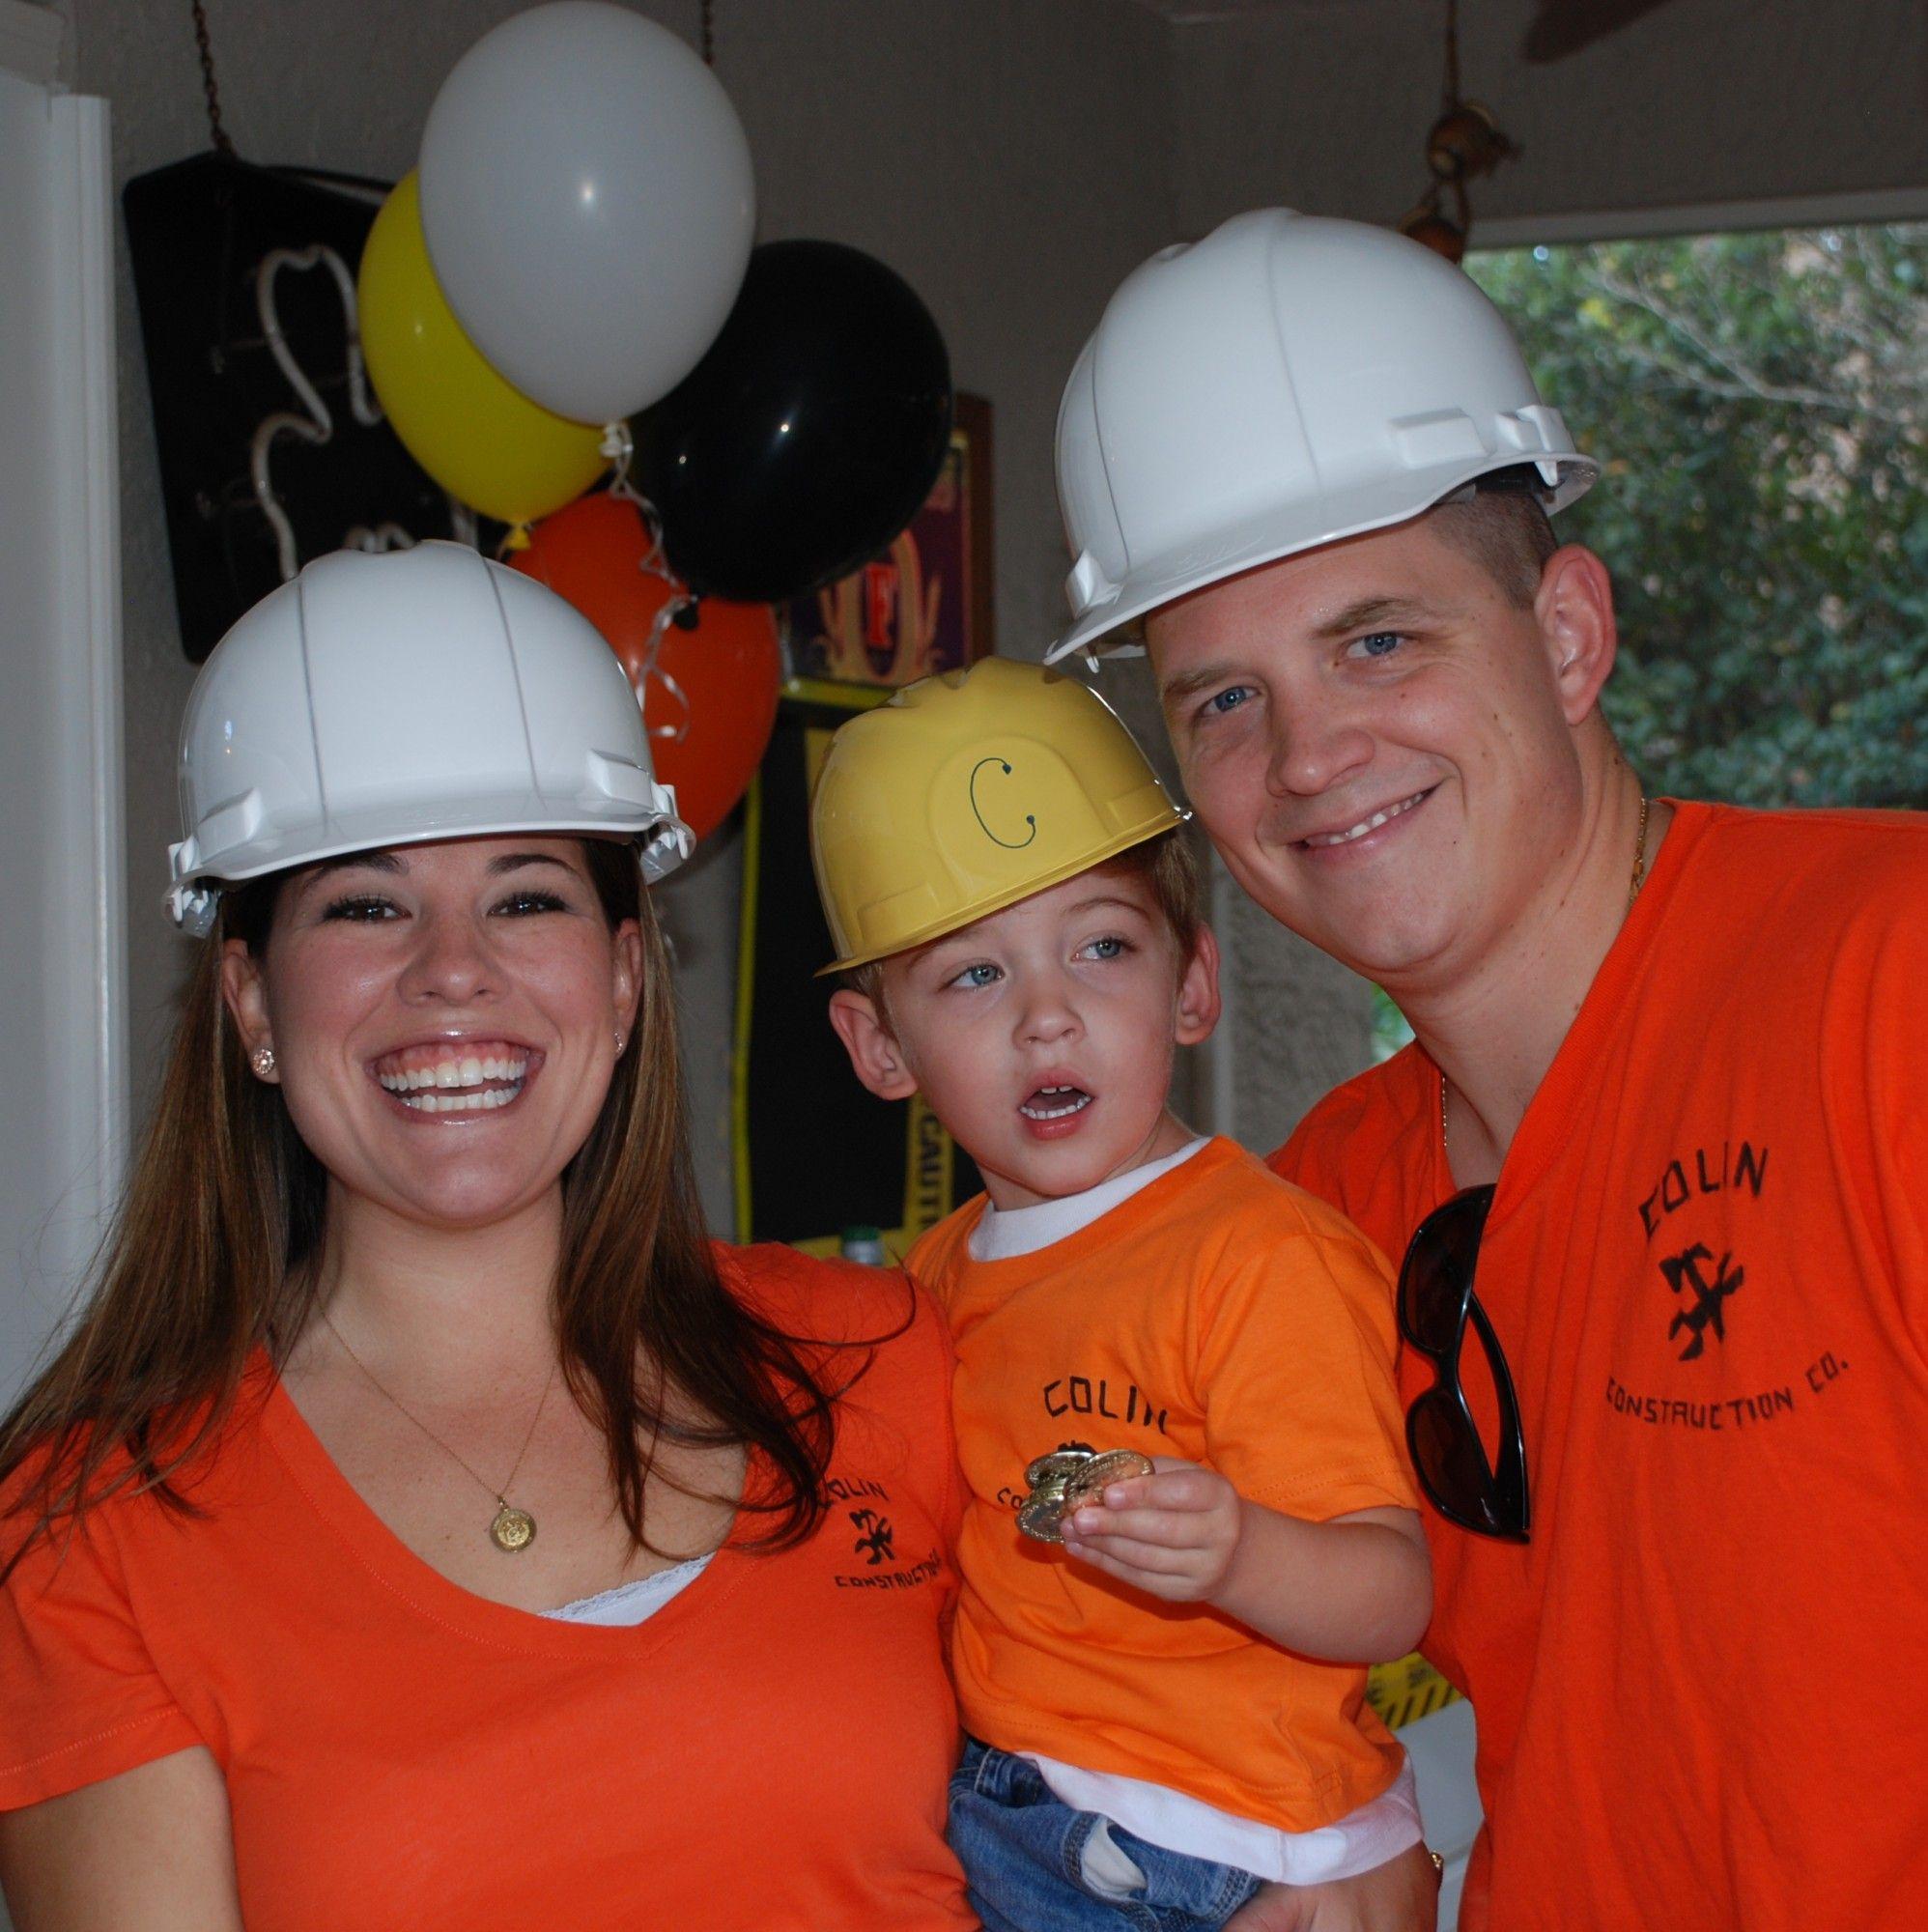 construction birthday shirts